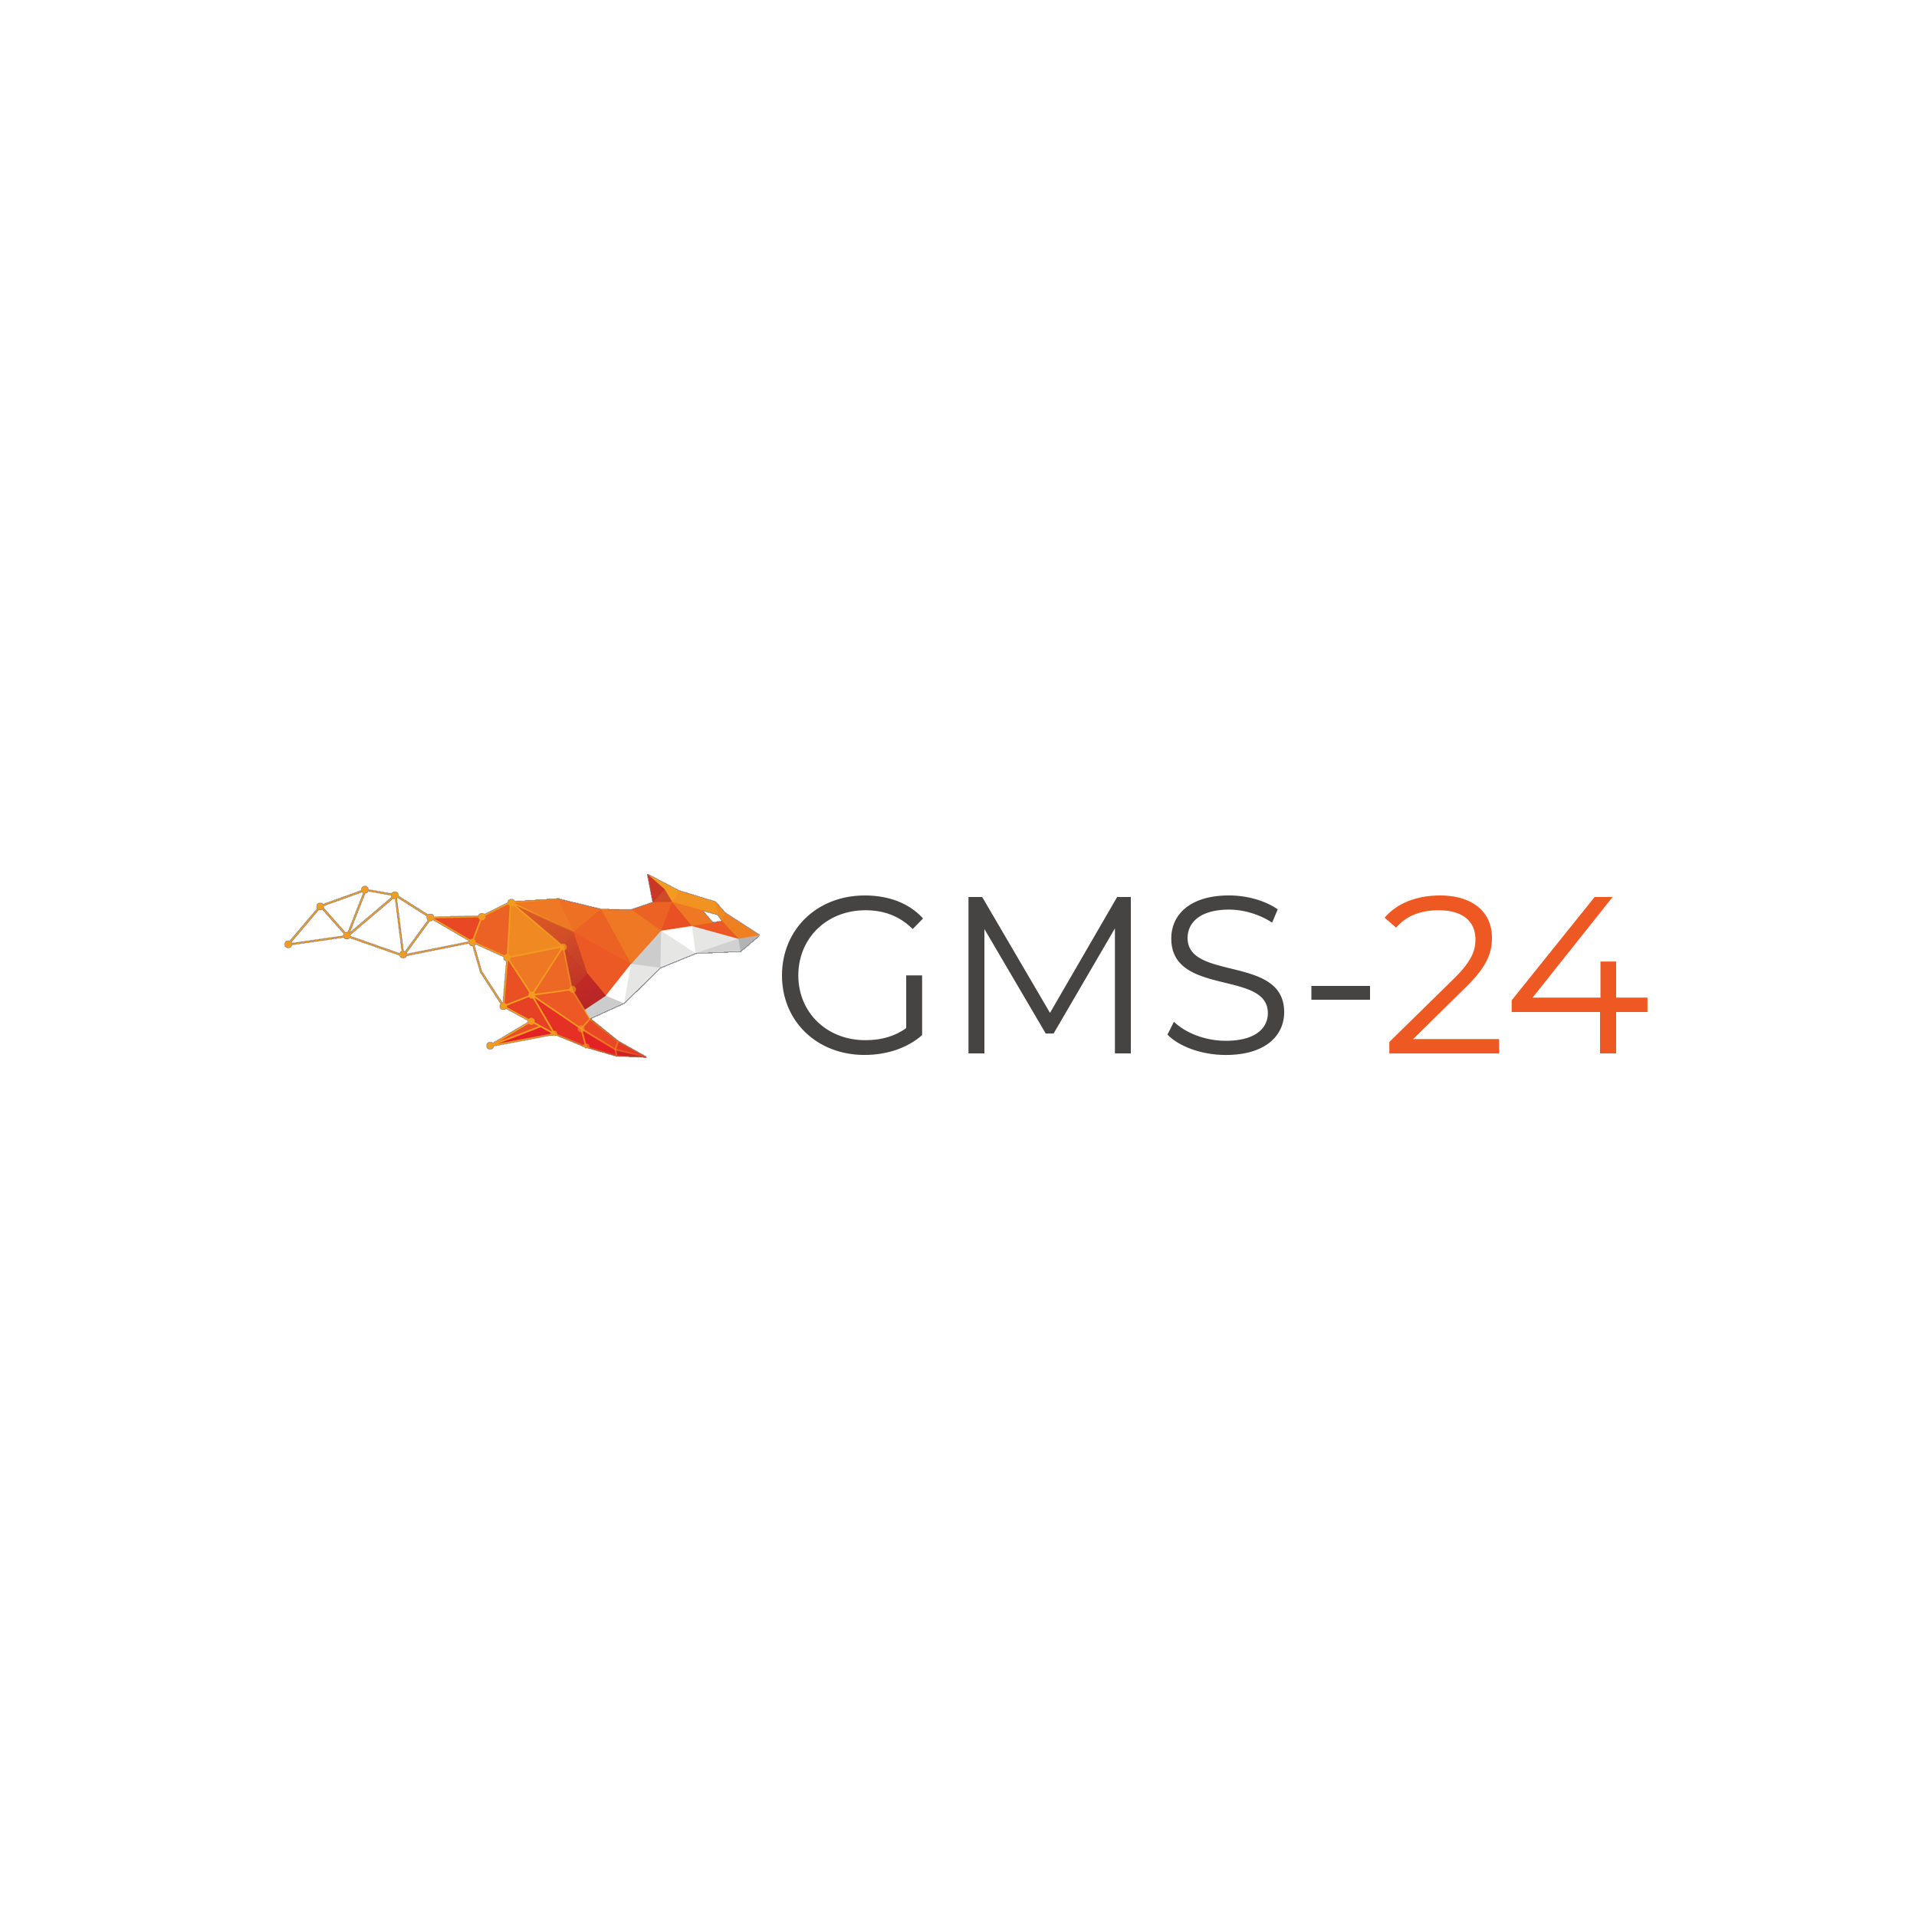 German Mold Service 24 Anbieter für Rapid-Tooling, Spritzguss, CNC Fräsen, Prototypen-Spritzguss